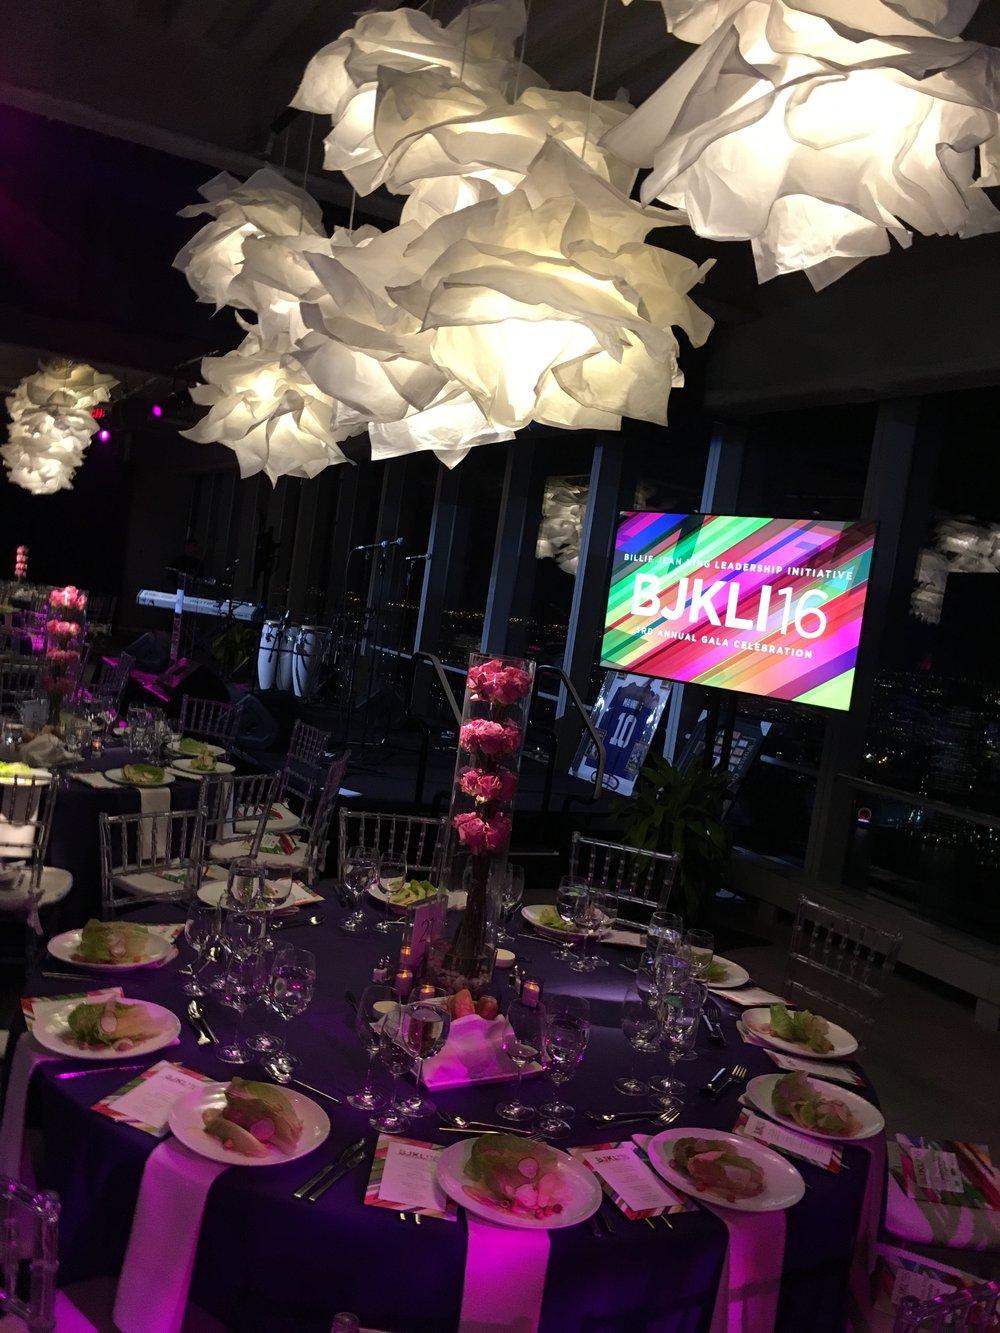 Billie Jean King Annual Gala at 4WTC